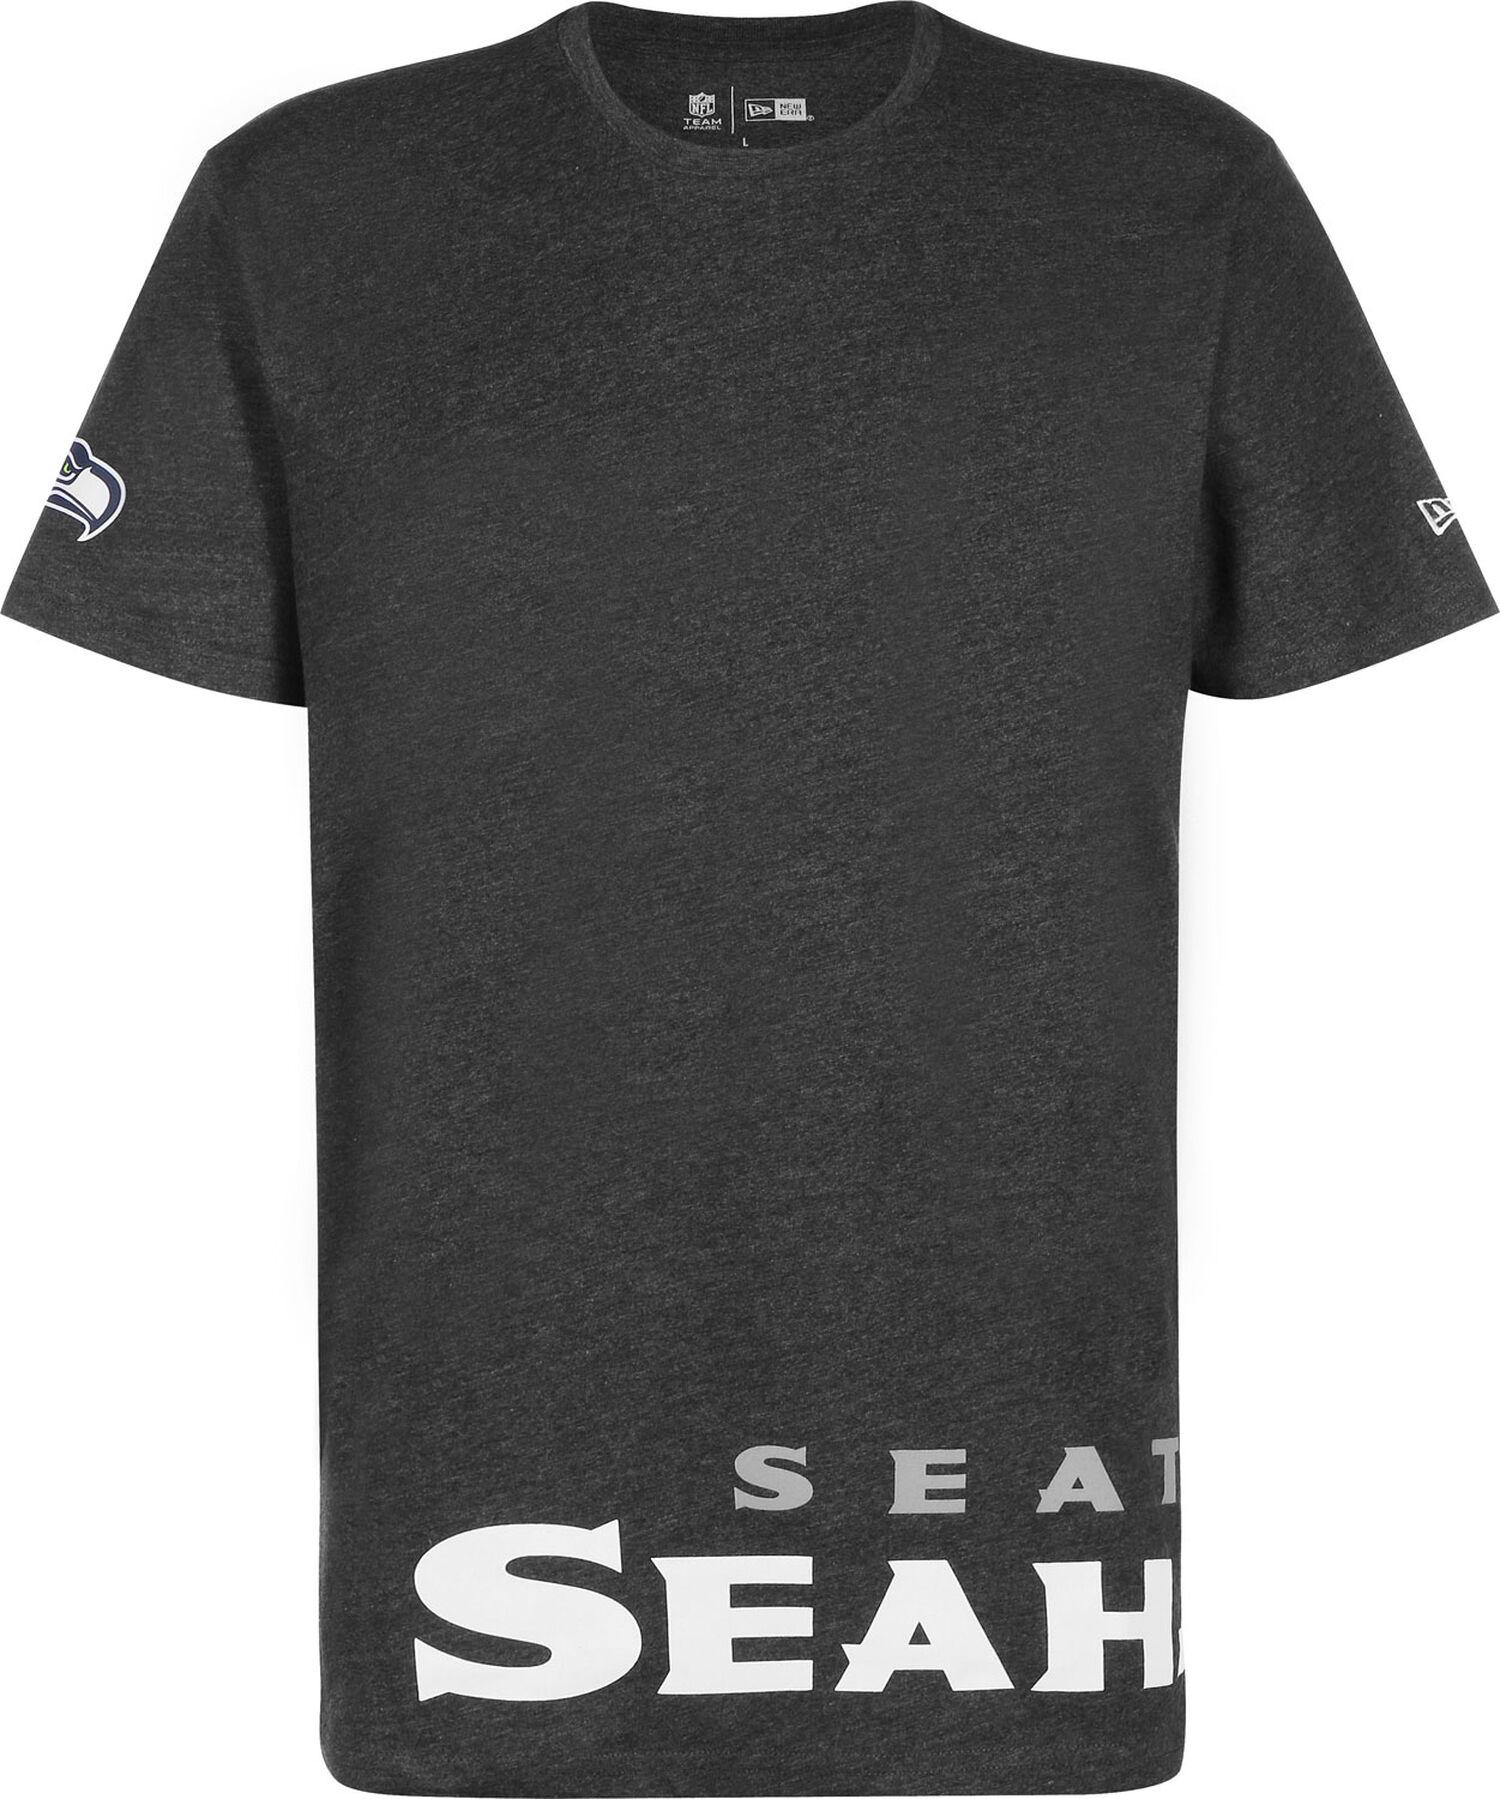 NFL Wrap Around Seattle Seahawks